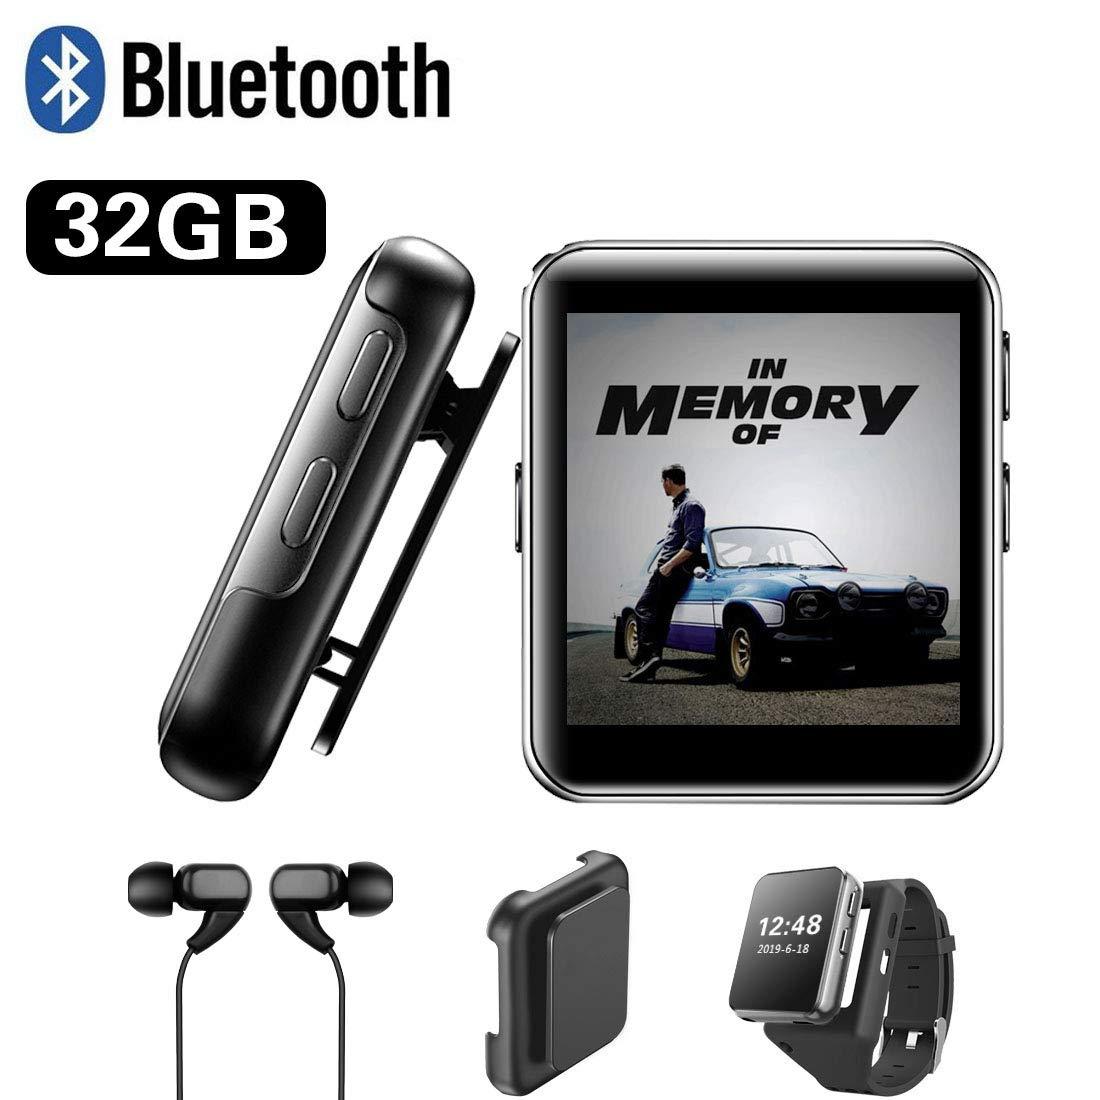 Bluetooth Headphones Recorder Lossless Running